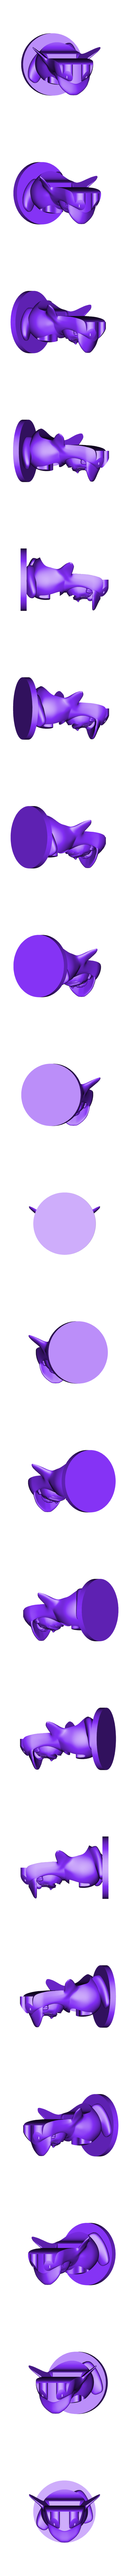 Body.stl Download free STL file Penguin Suit • Object to 3D print, ROYLO